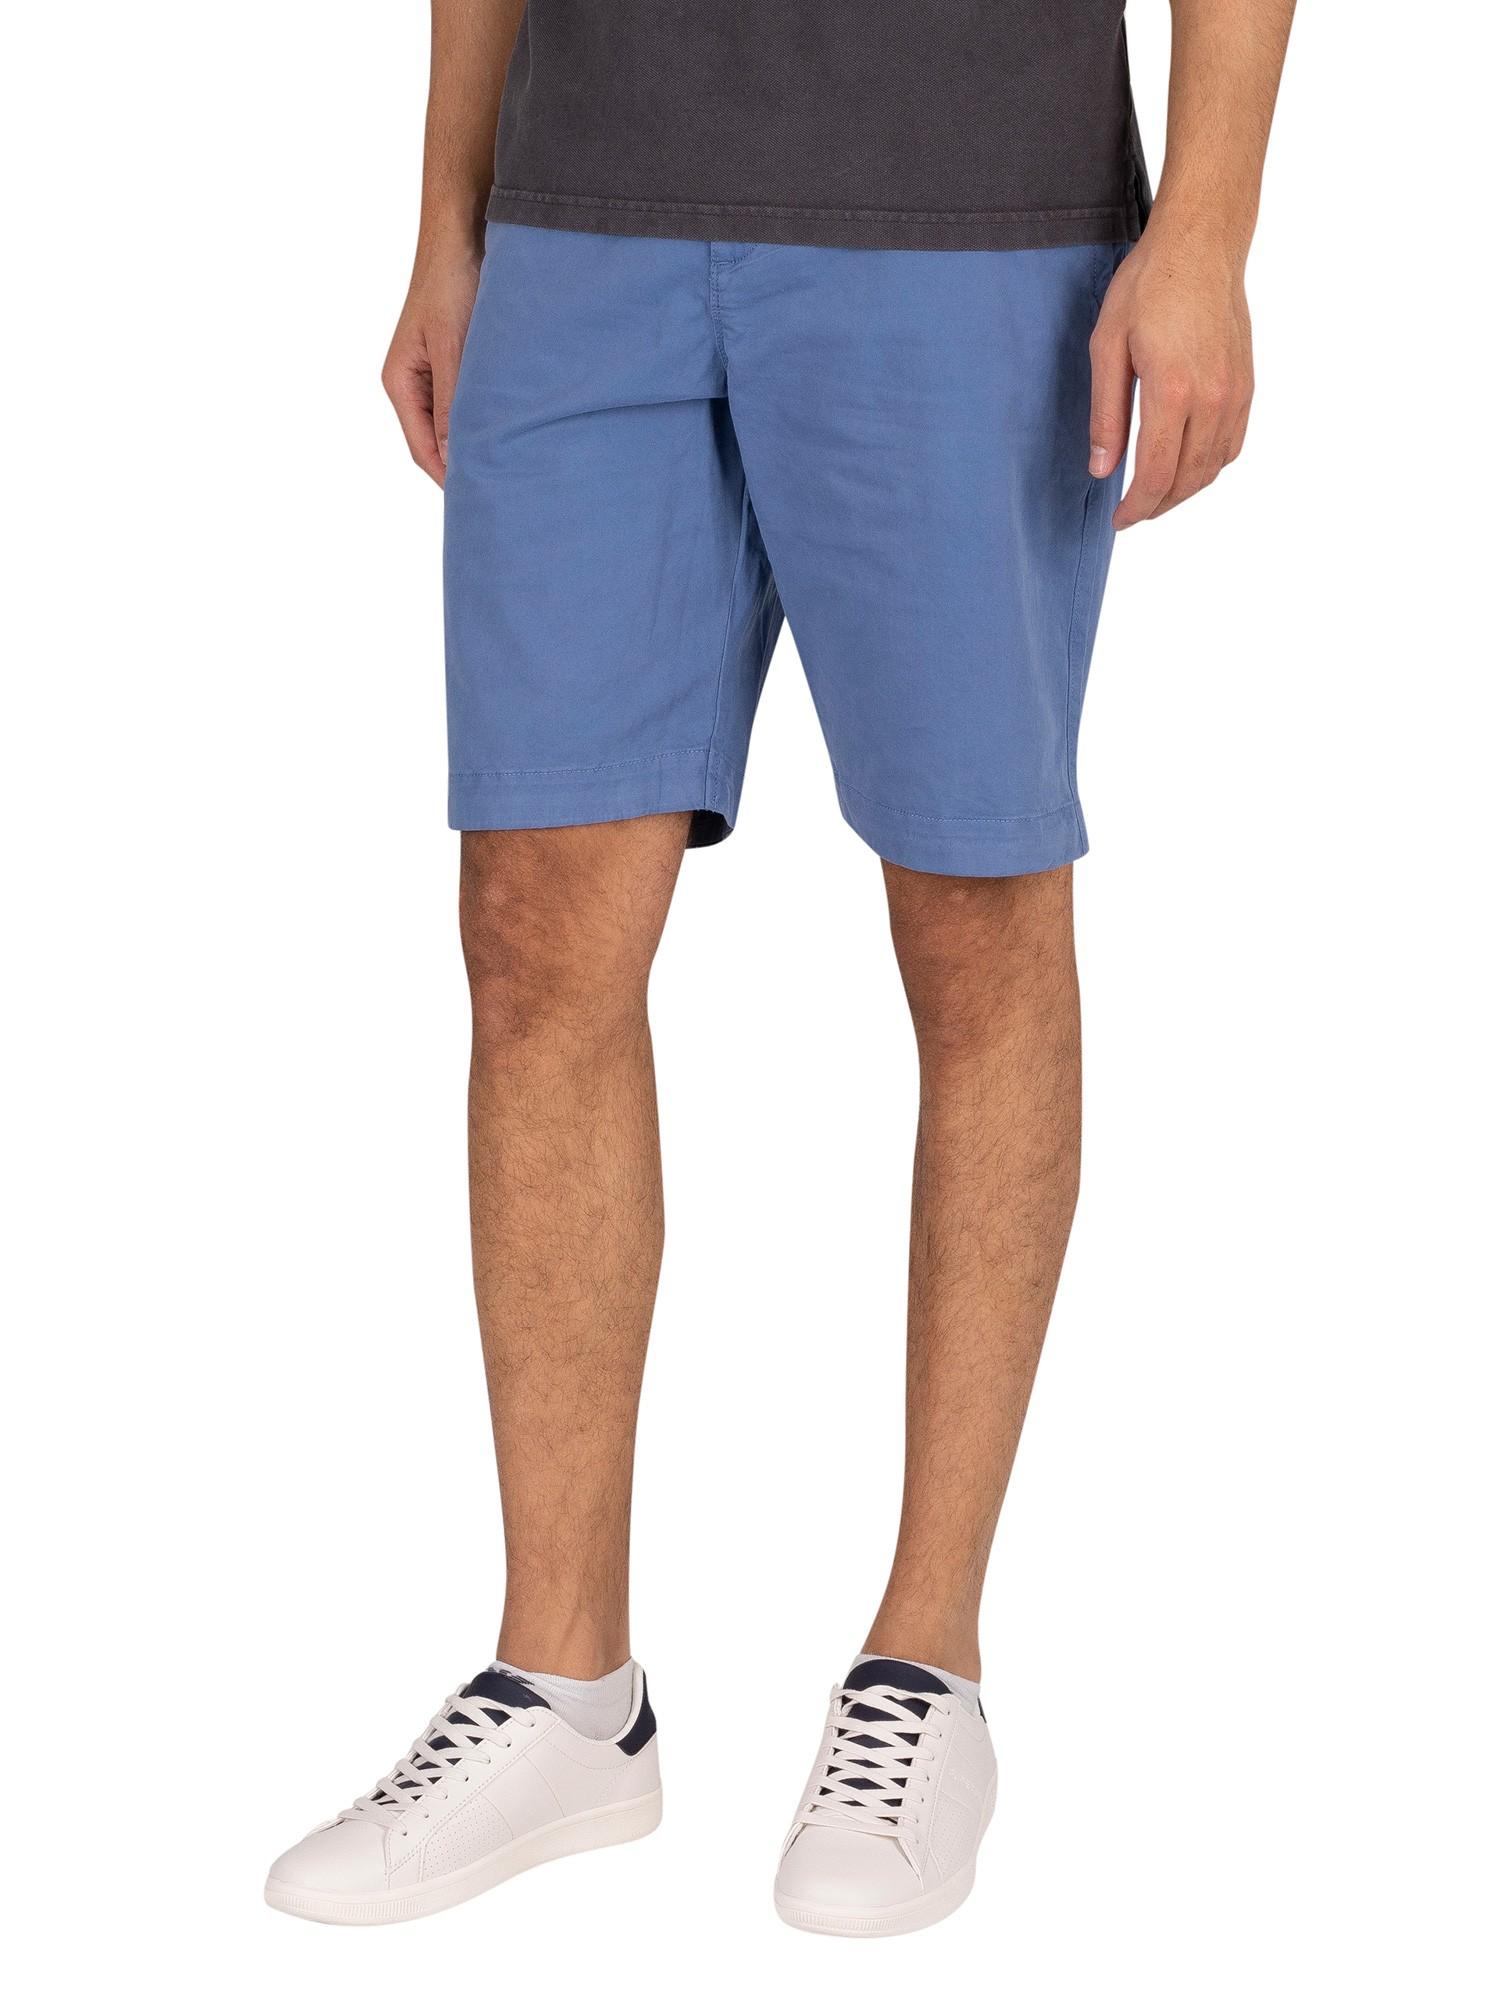 International-Chino-Shorts